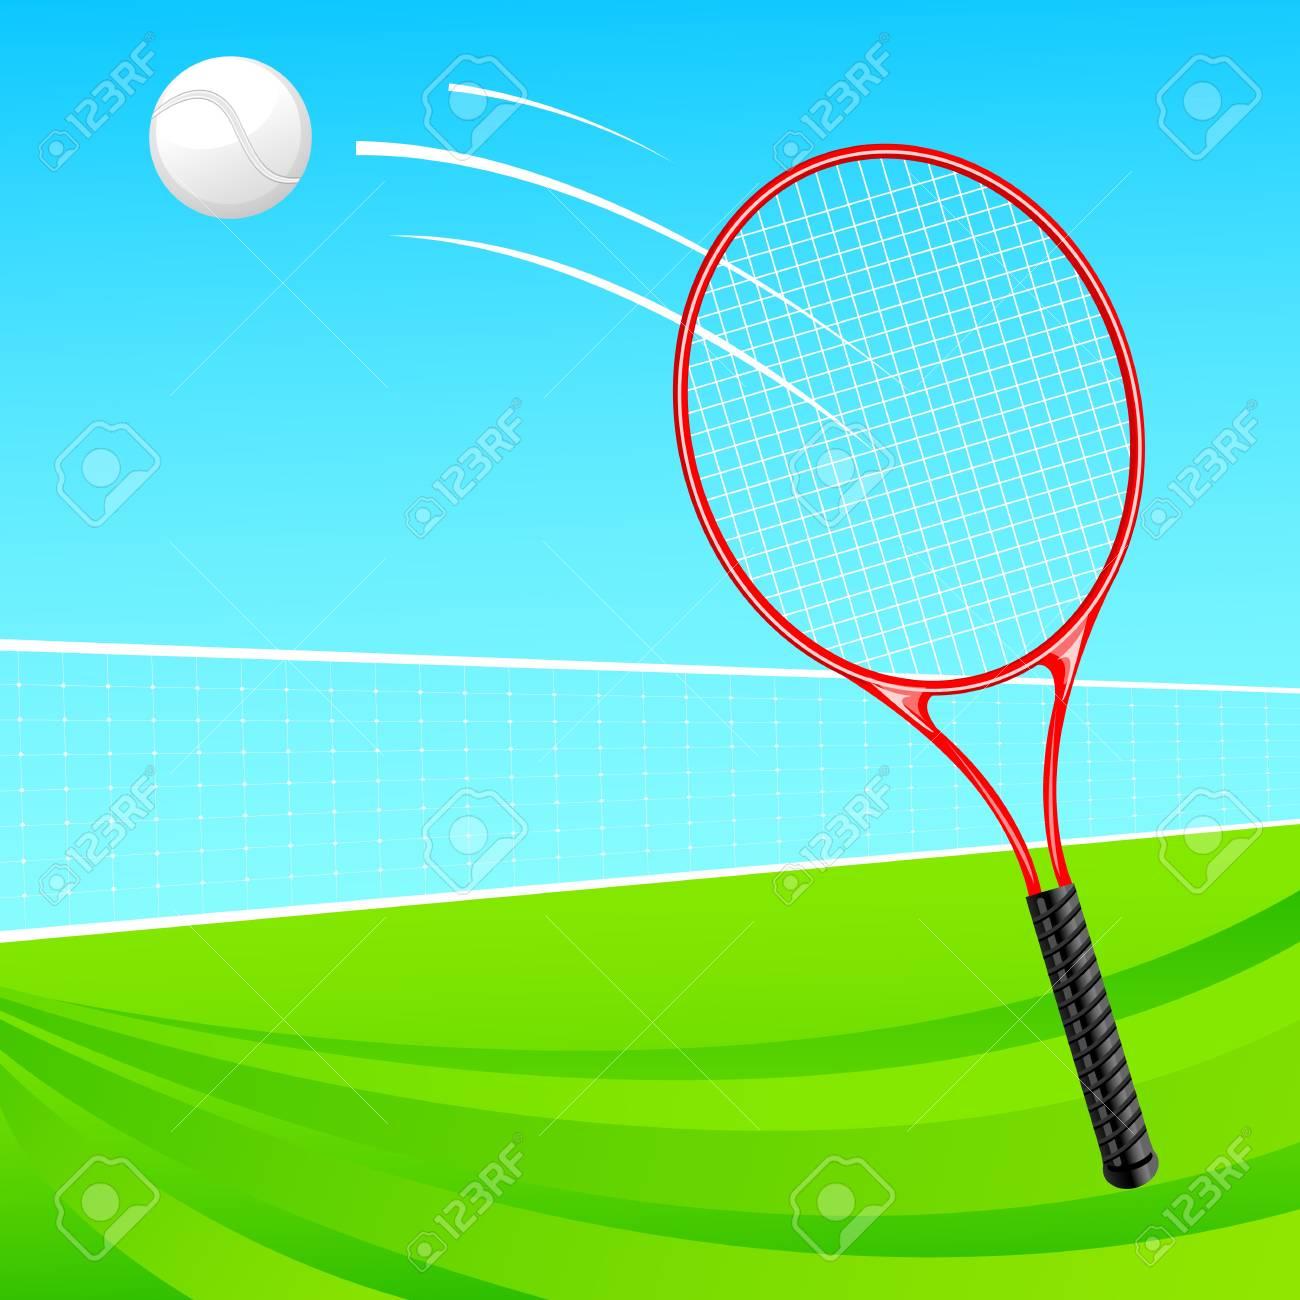 Tennis Racket and Ball Stock Vector - 18810763